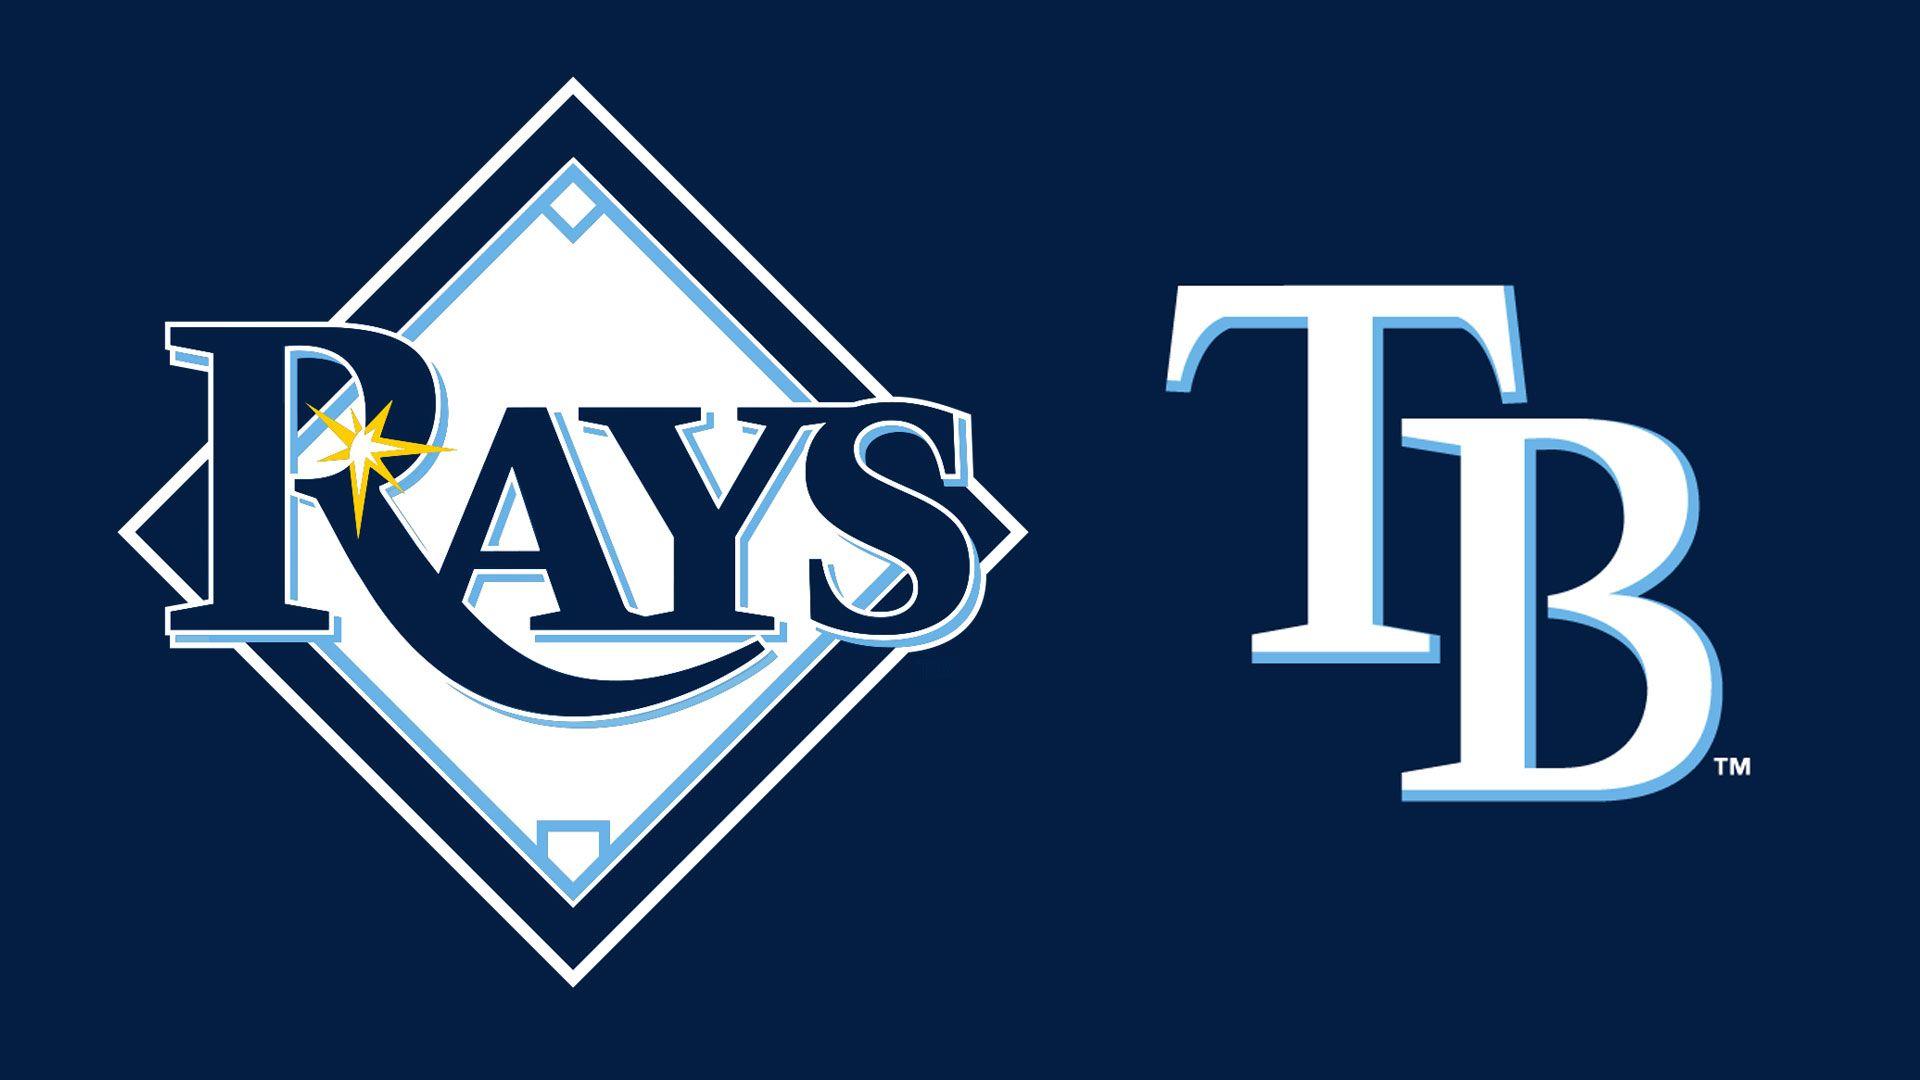 Mlb Tampa Bay Rays Logo 1920x1080 Wallpaper Tampa Bay Rays Rays